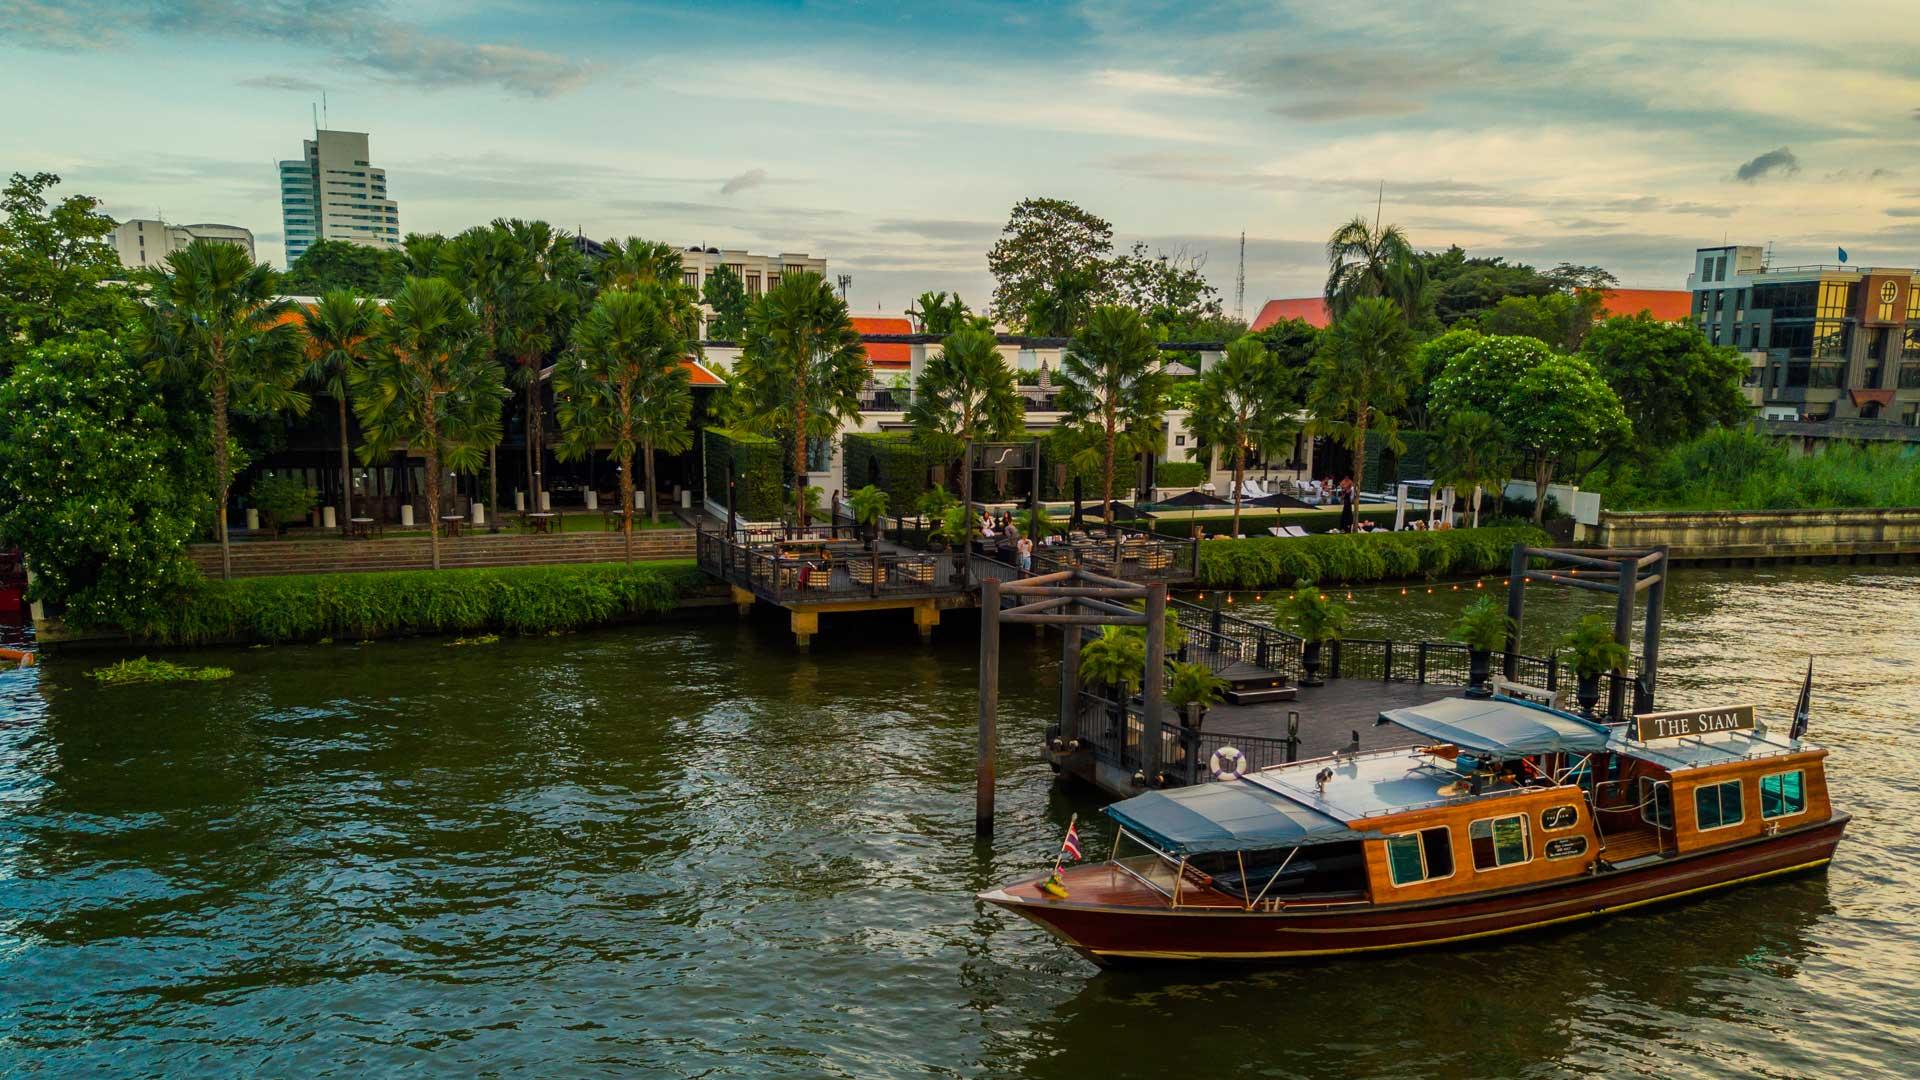 The Siam's Pier & Shuttle Boat